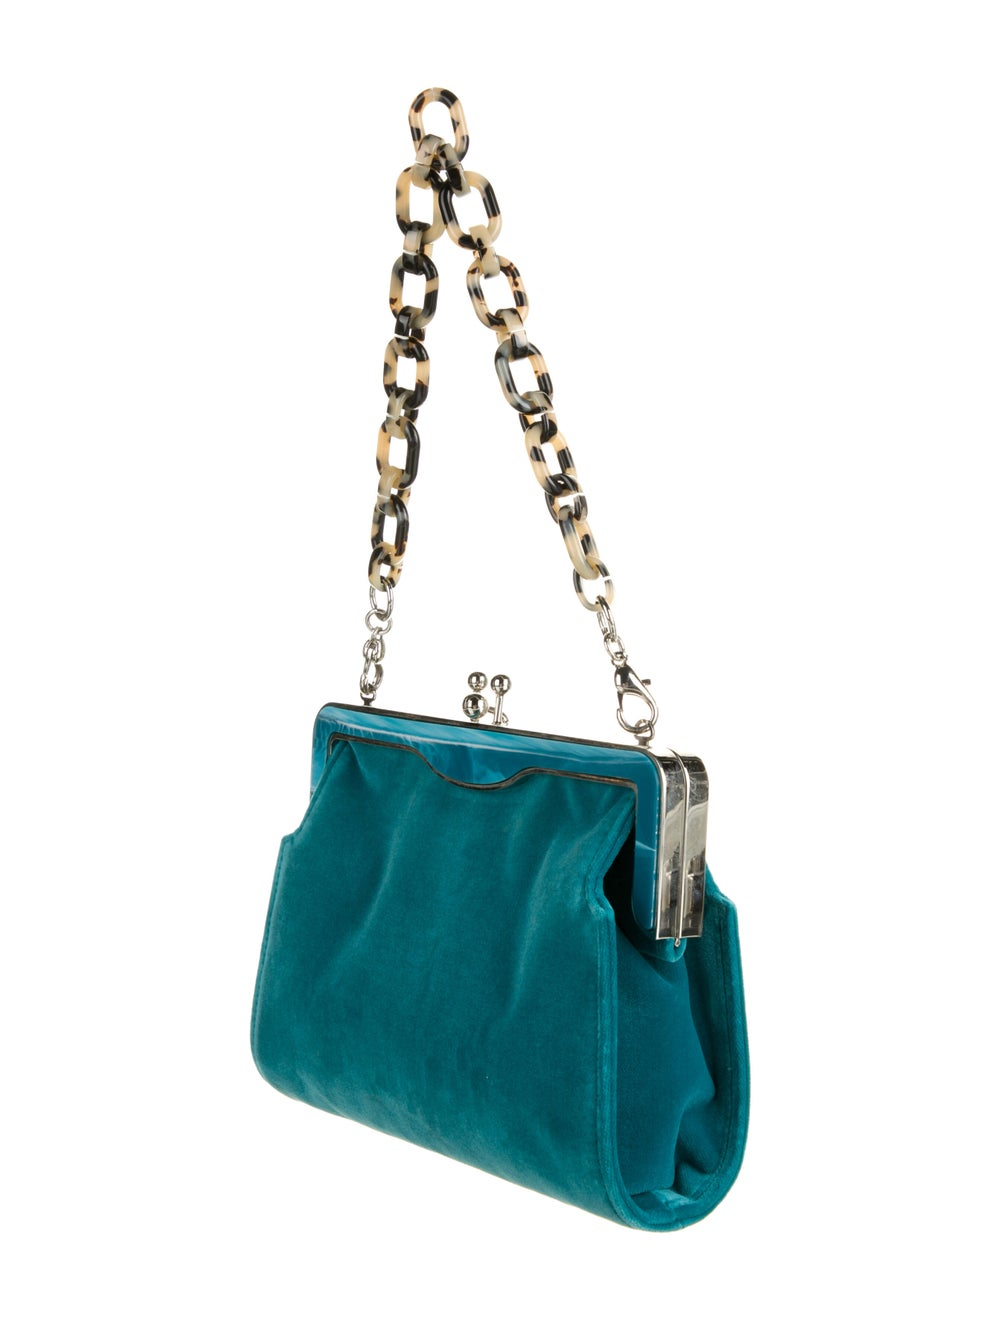 Edie Parker Velvet Handle Bag Green - image 3